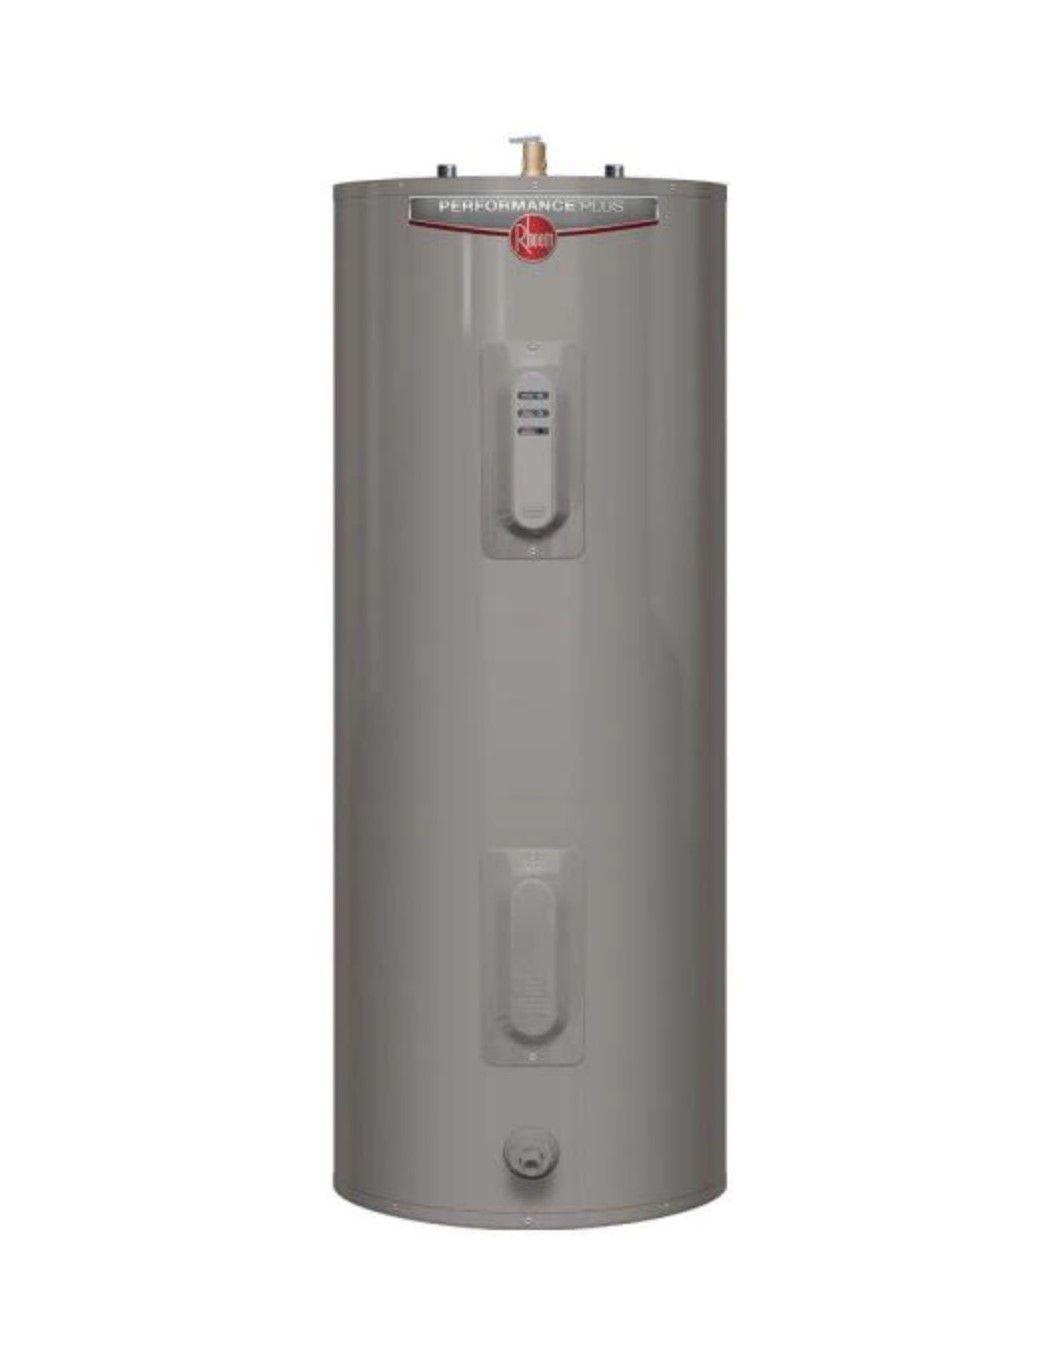 Rheem Performance Plus 50 Gallon Electric Tank Water Heater